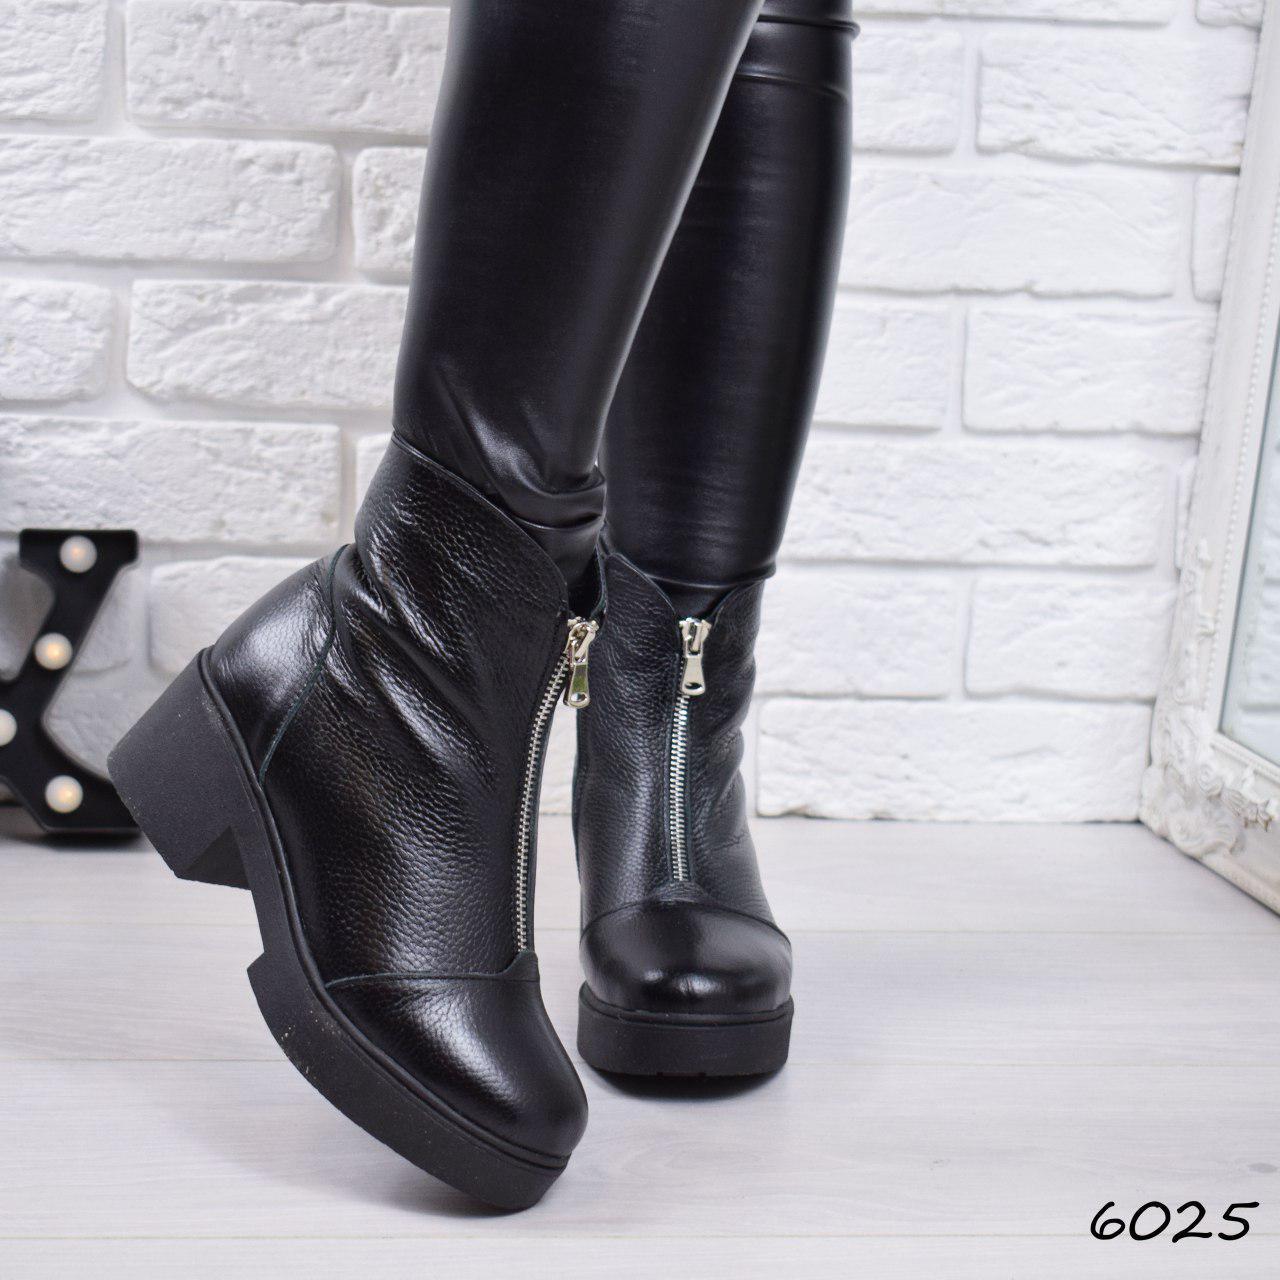 f978b9453e2746 Ботильоны женские на каблуке, черные